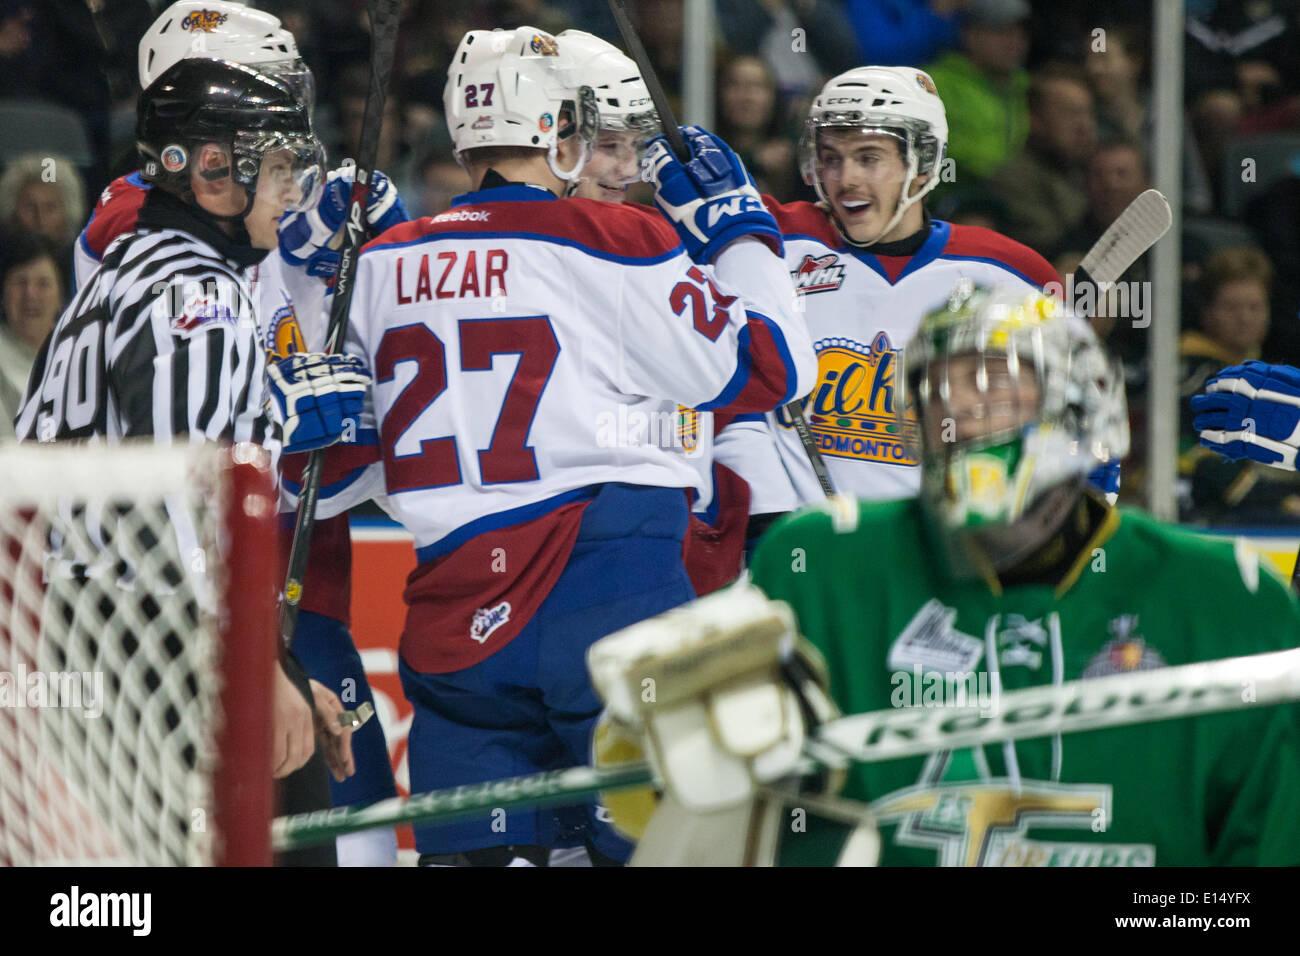 Quebec Major Junior Hockey League Stock Photos & Quebec